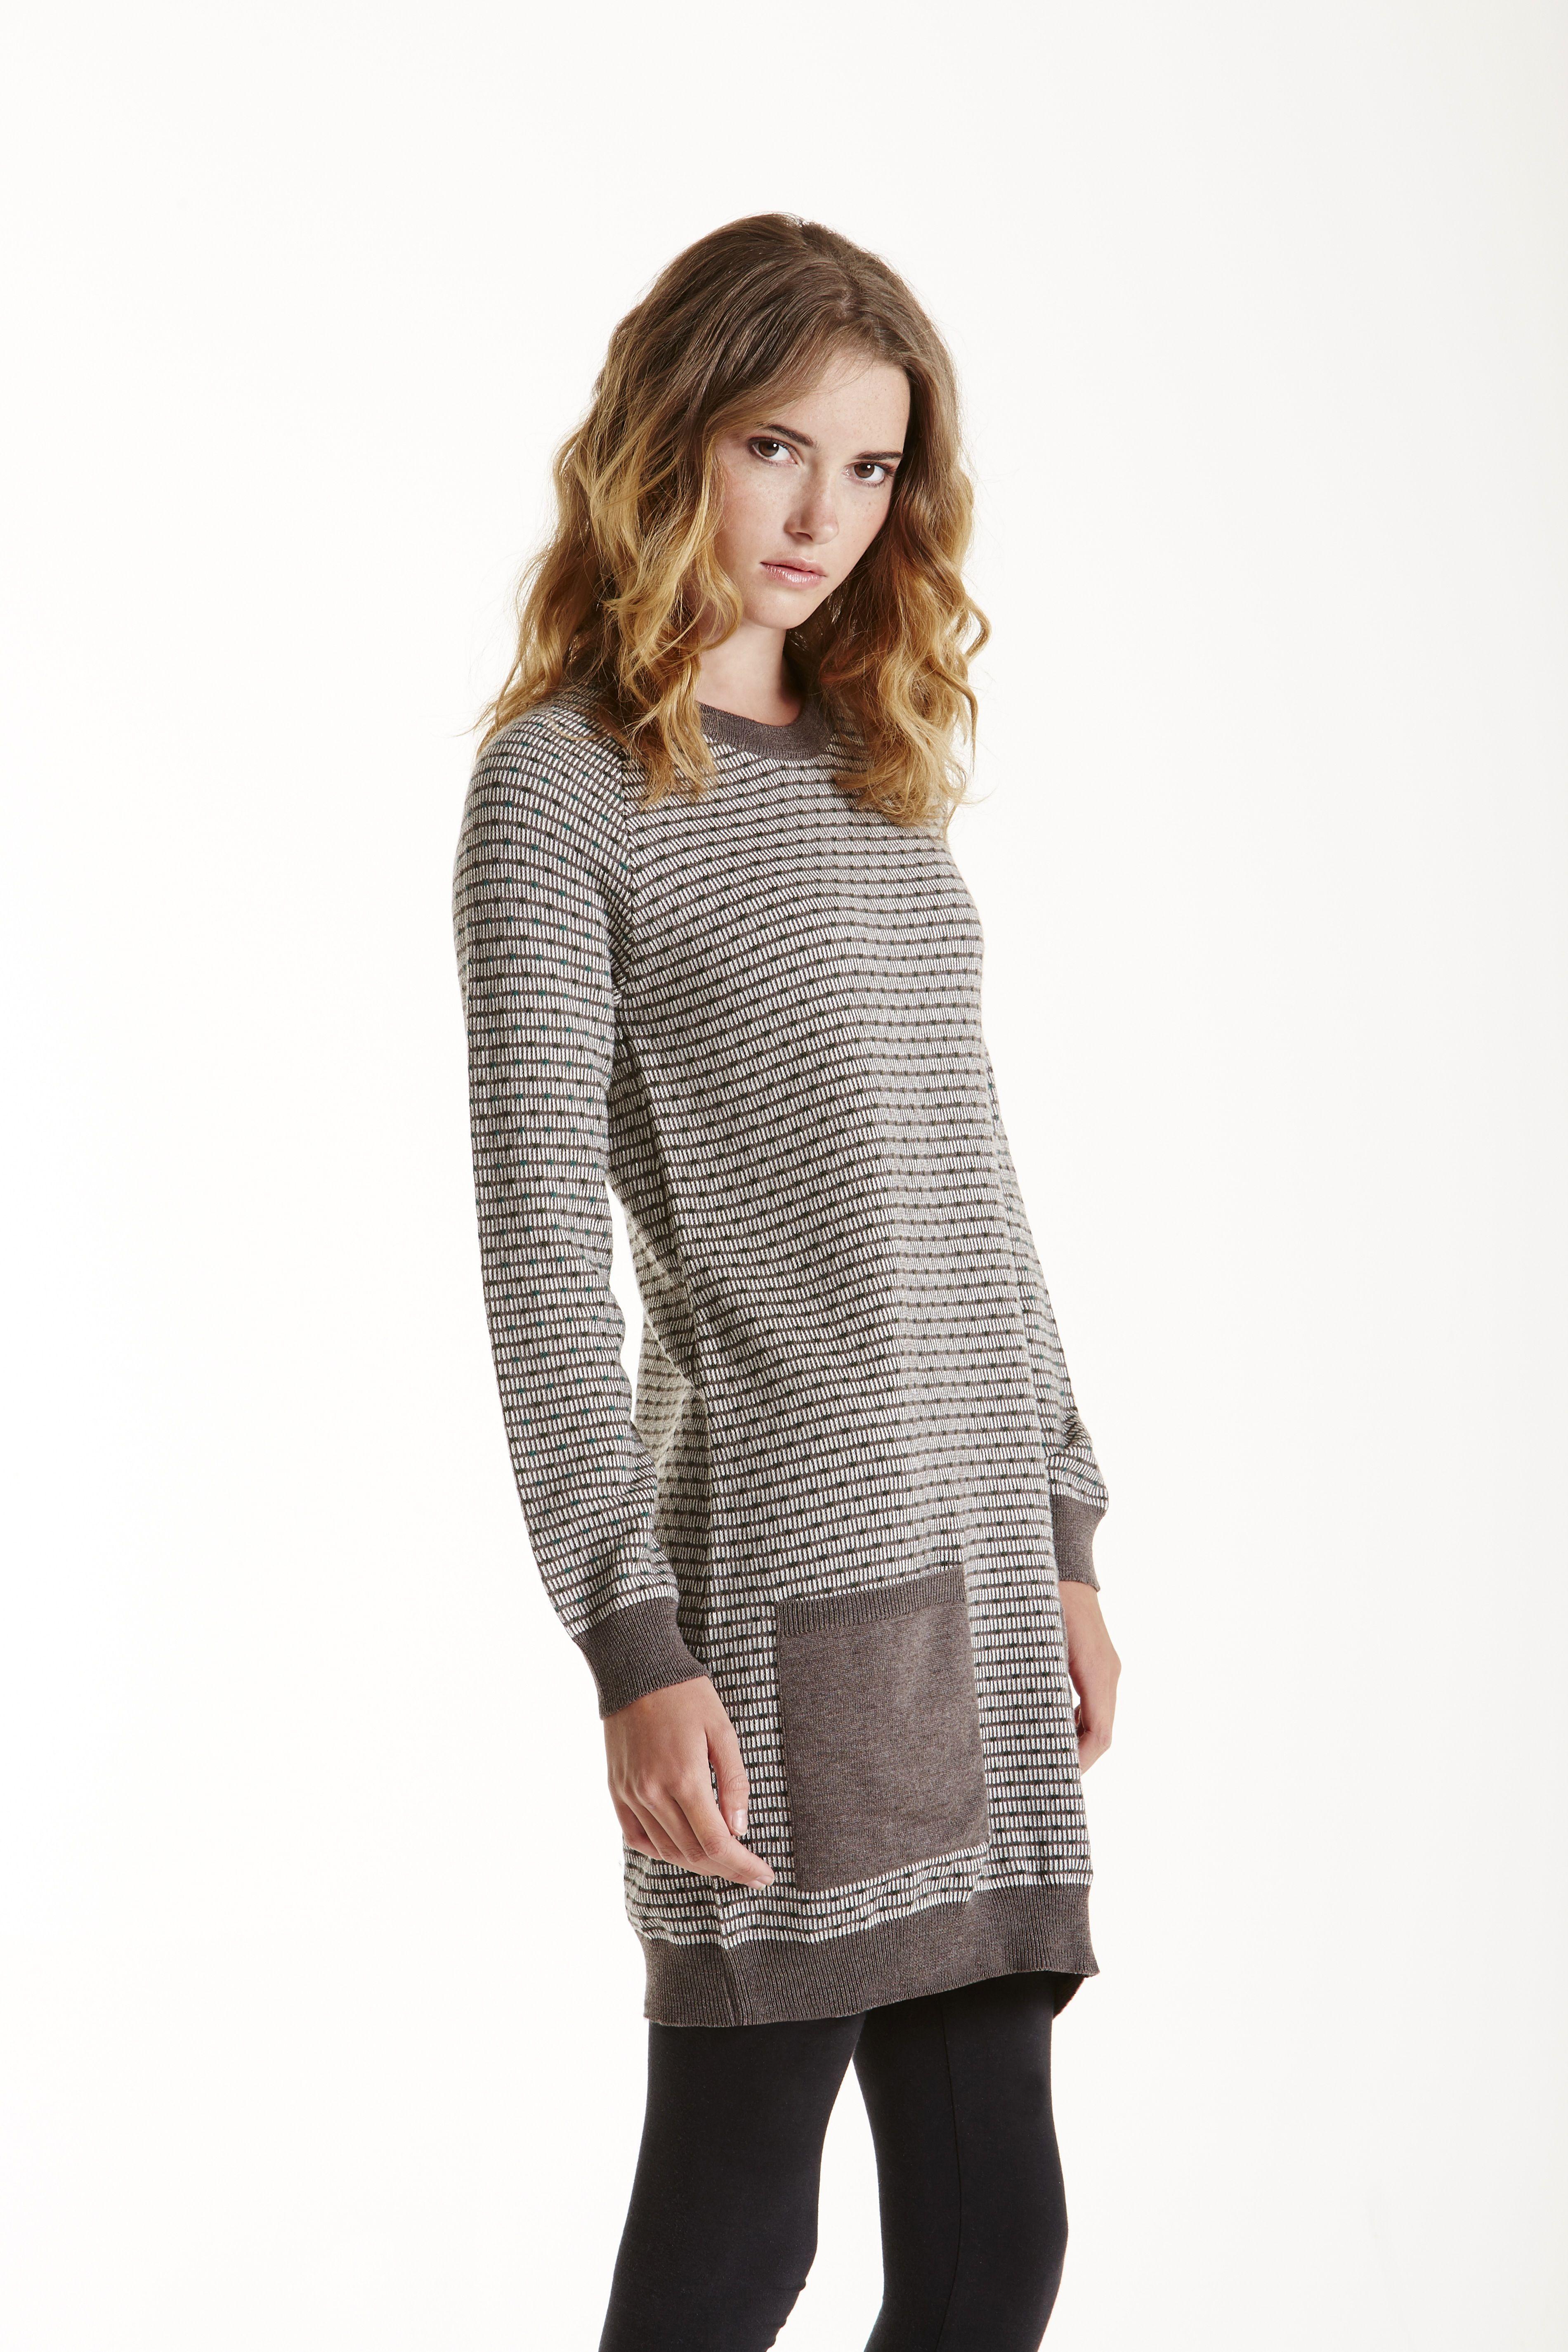 Anna merino jumper dress in mink with front pockets